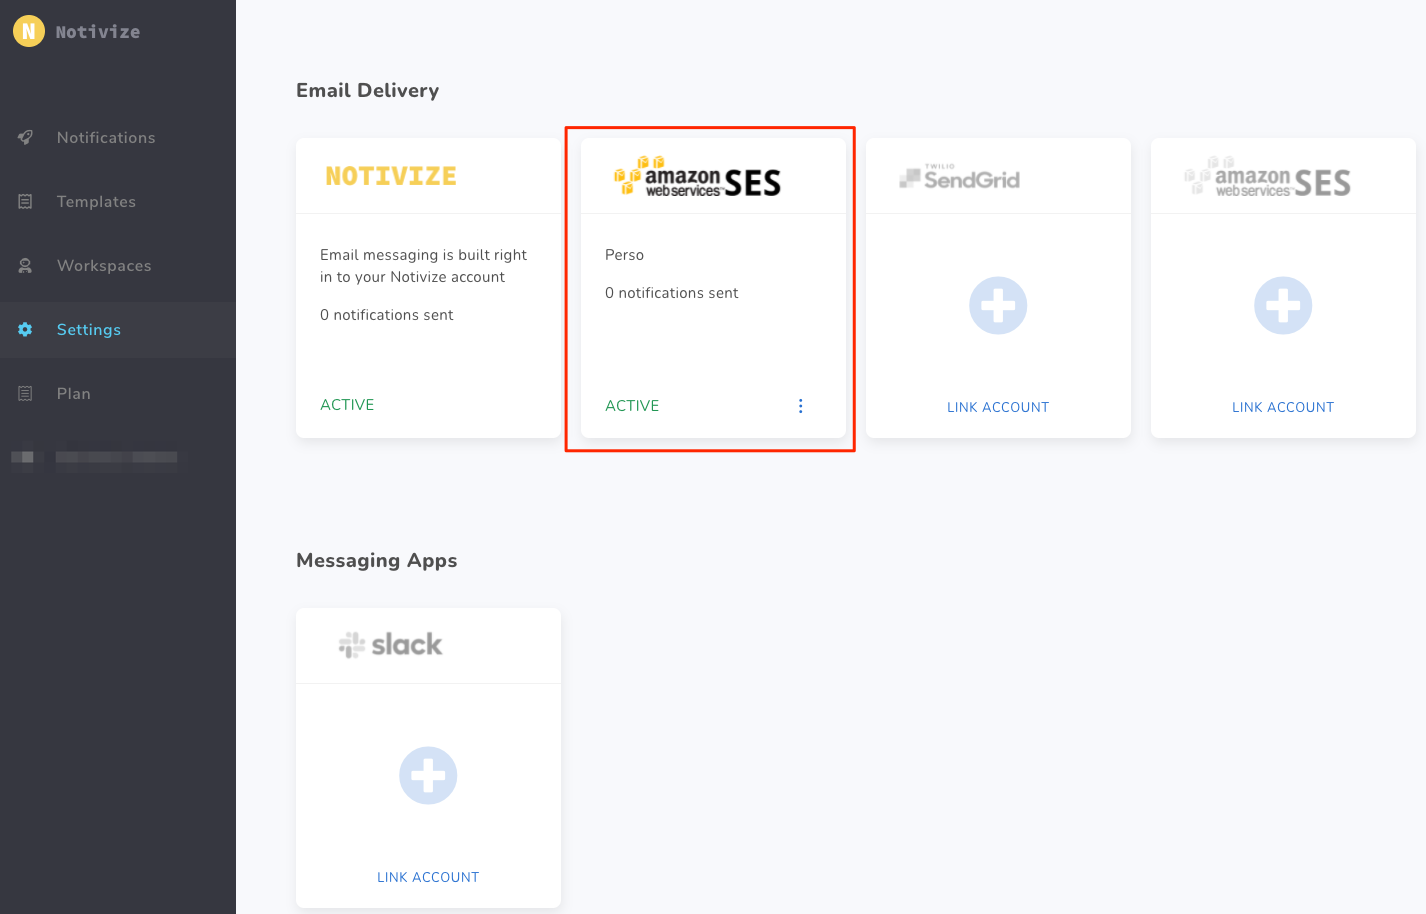 Amazon SES integration - Success